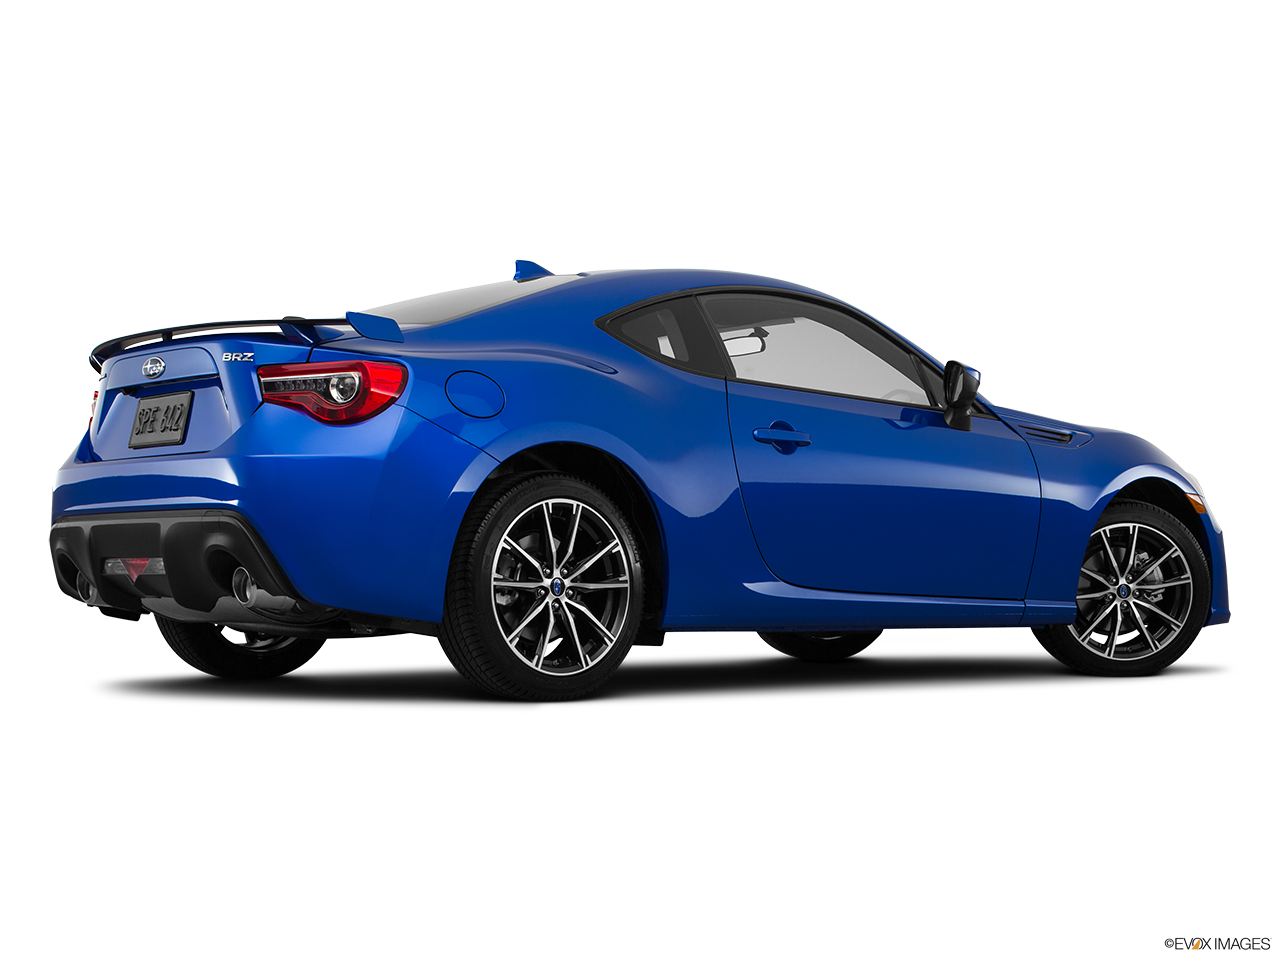 2019 Subaru BRZ photo